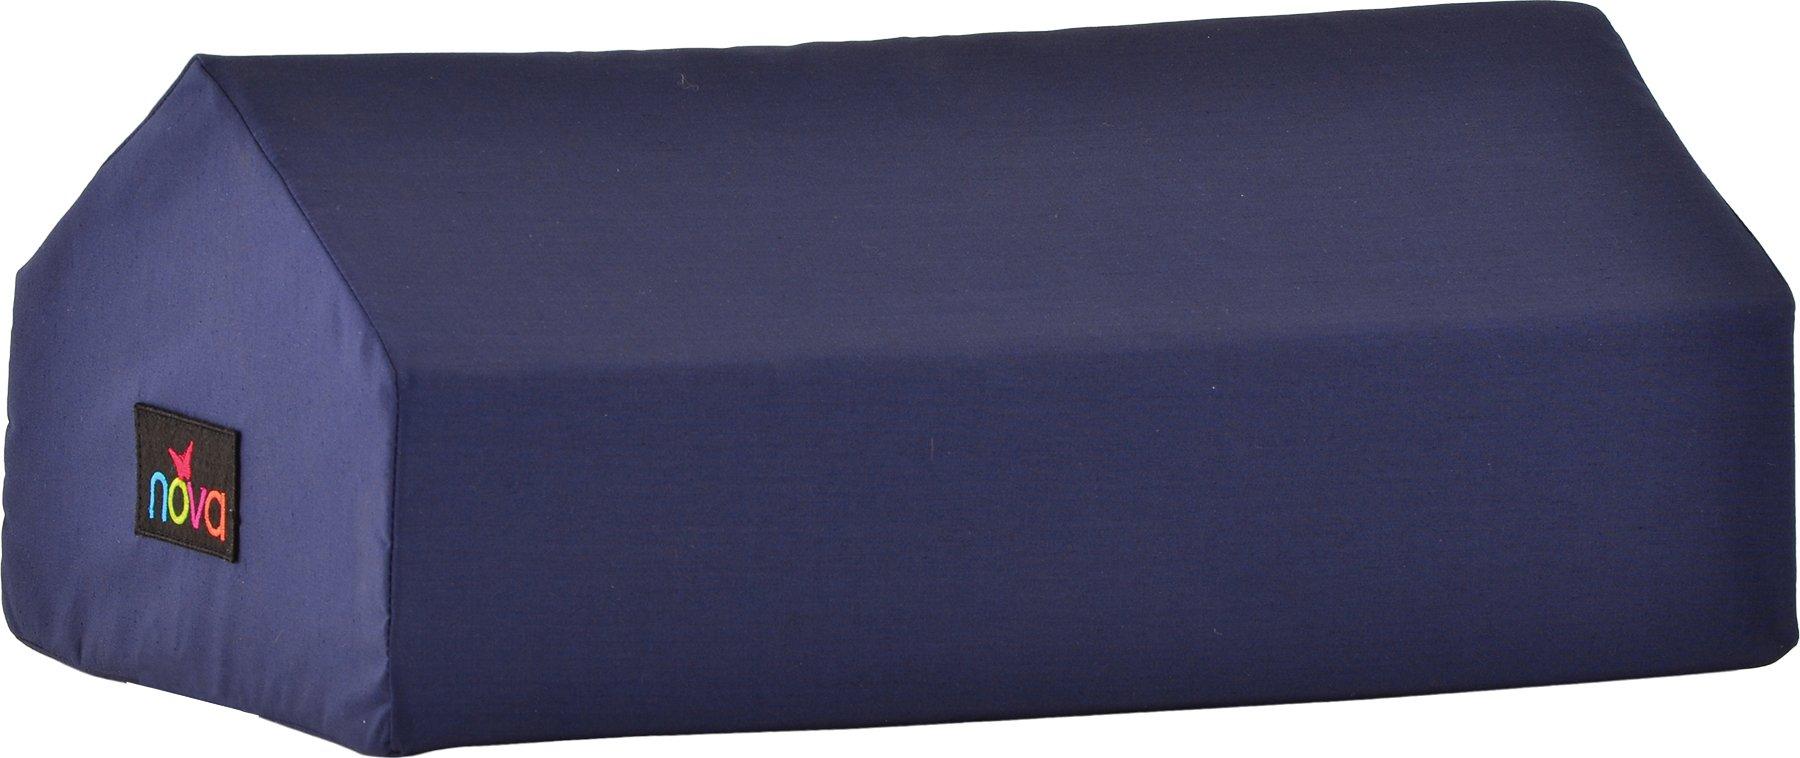 NOVA Medical Products Elevating Knee Wedge, Blue, 1.25 Pound